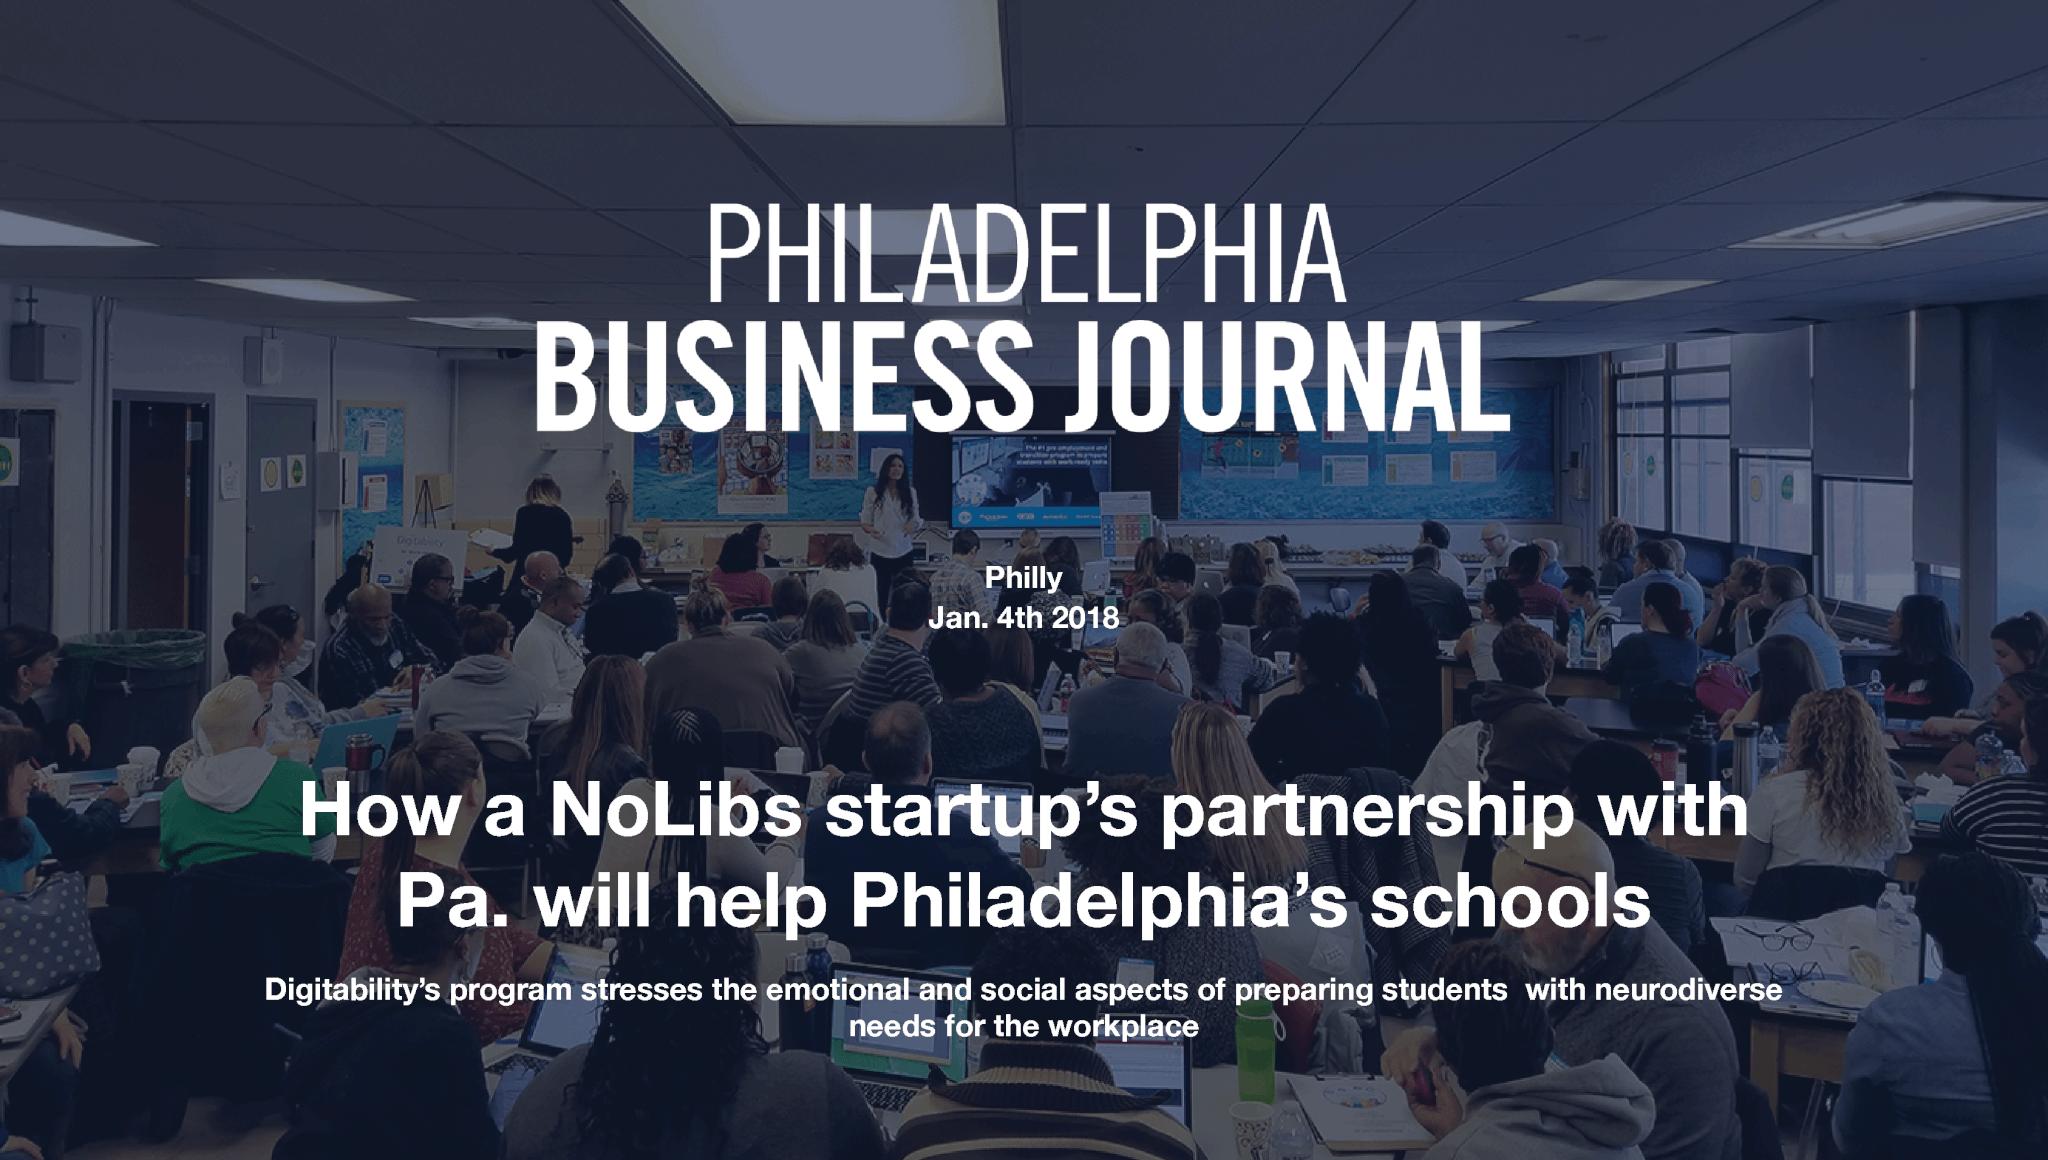 philadelphia-business-journal-digitability-pa-ovr